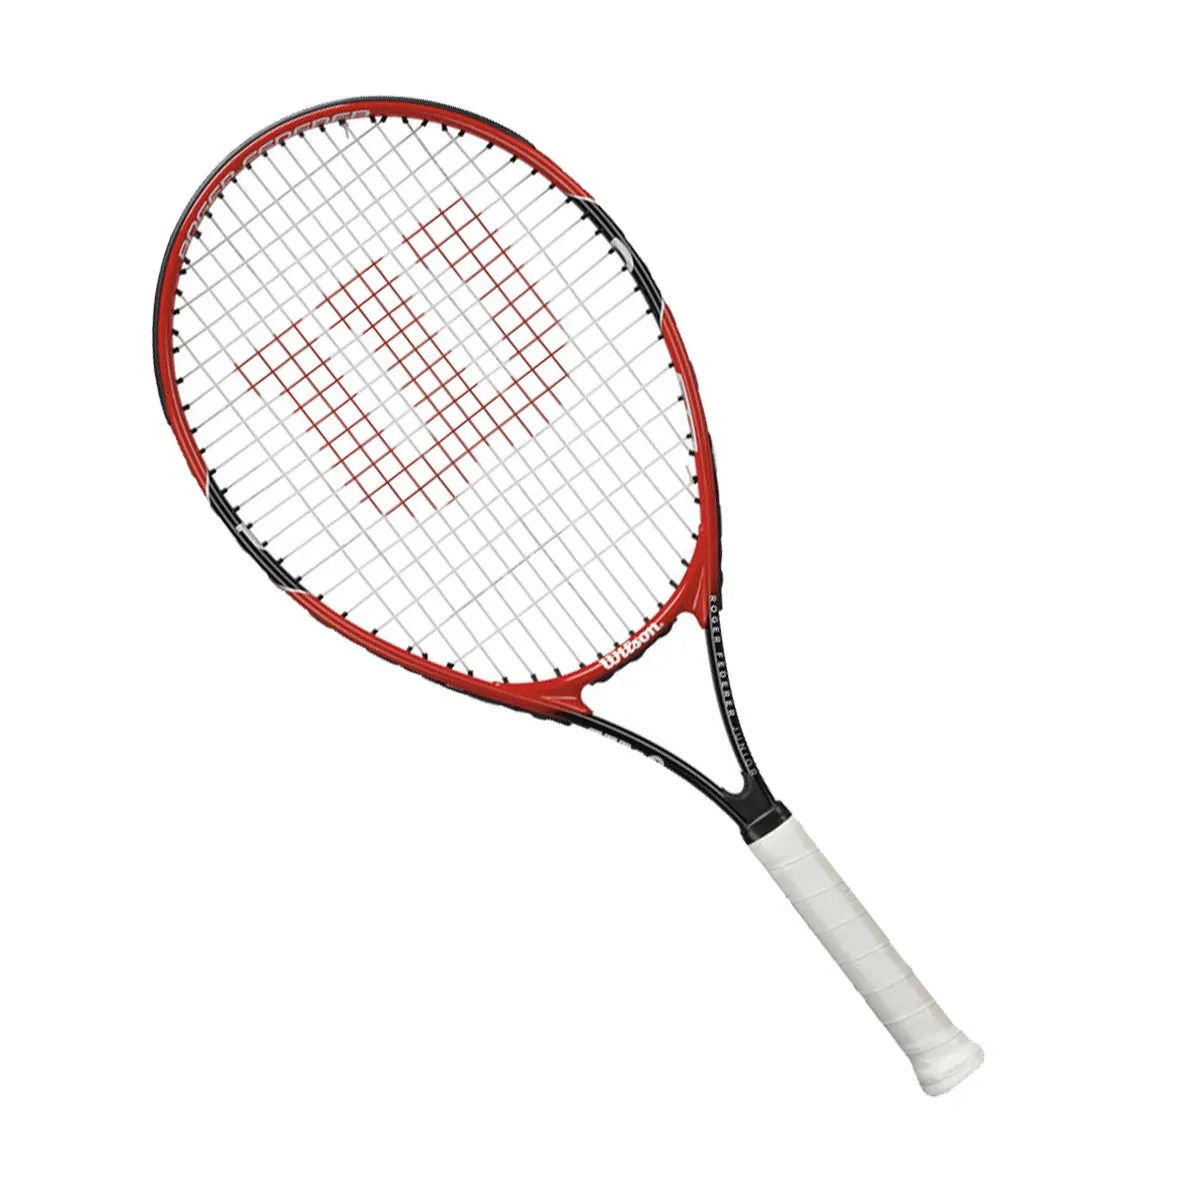 01410686b Raquete de Tênis Wilson Roger Federer 26